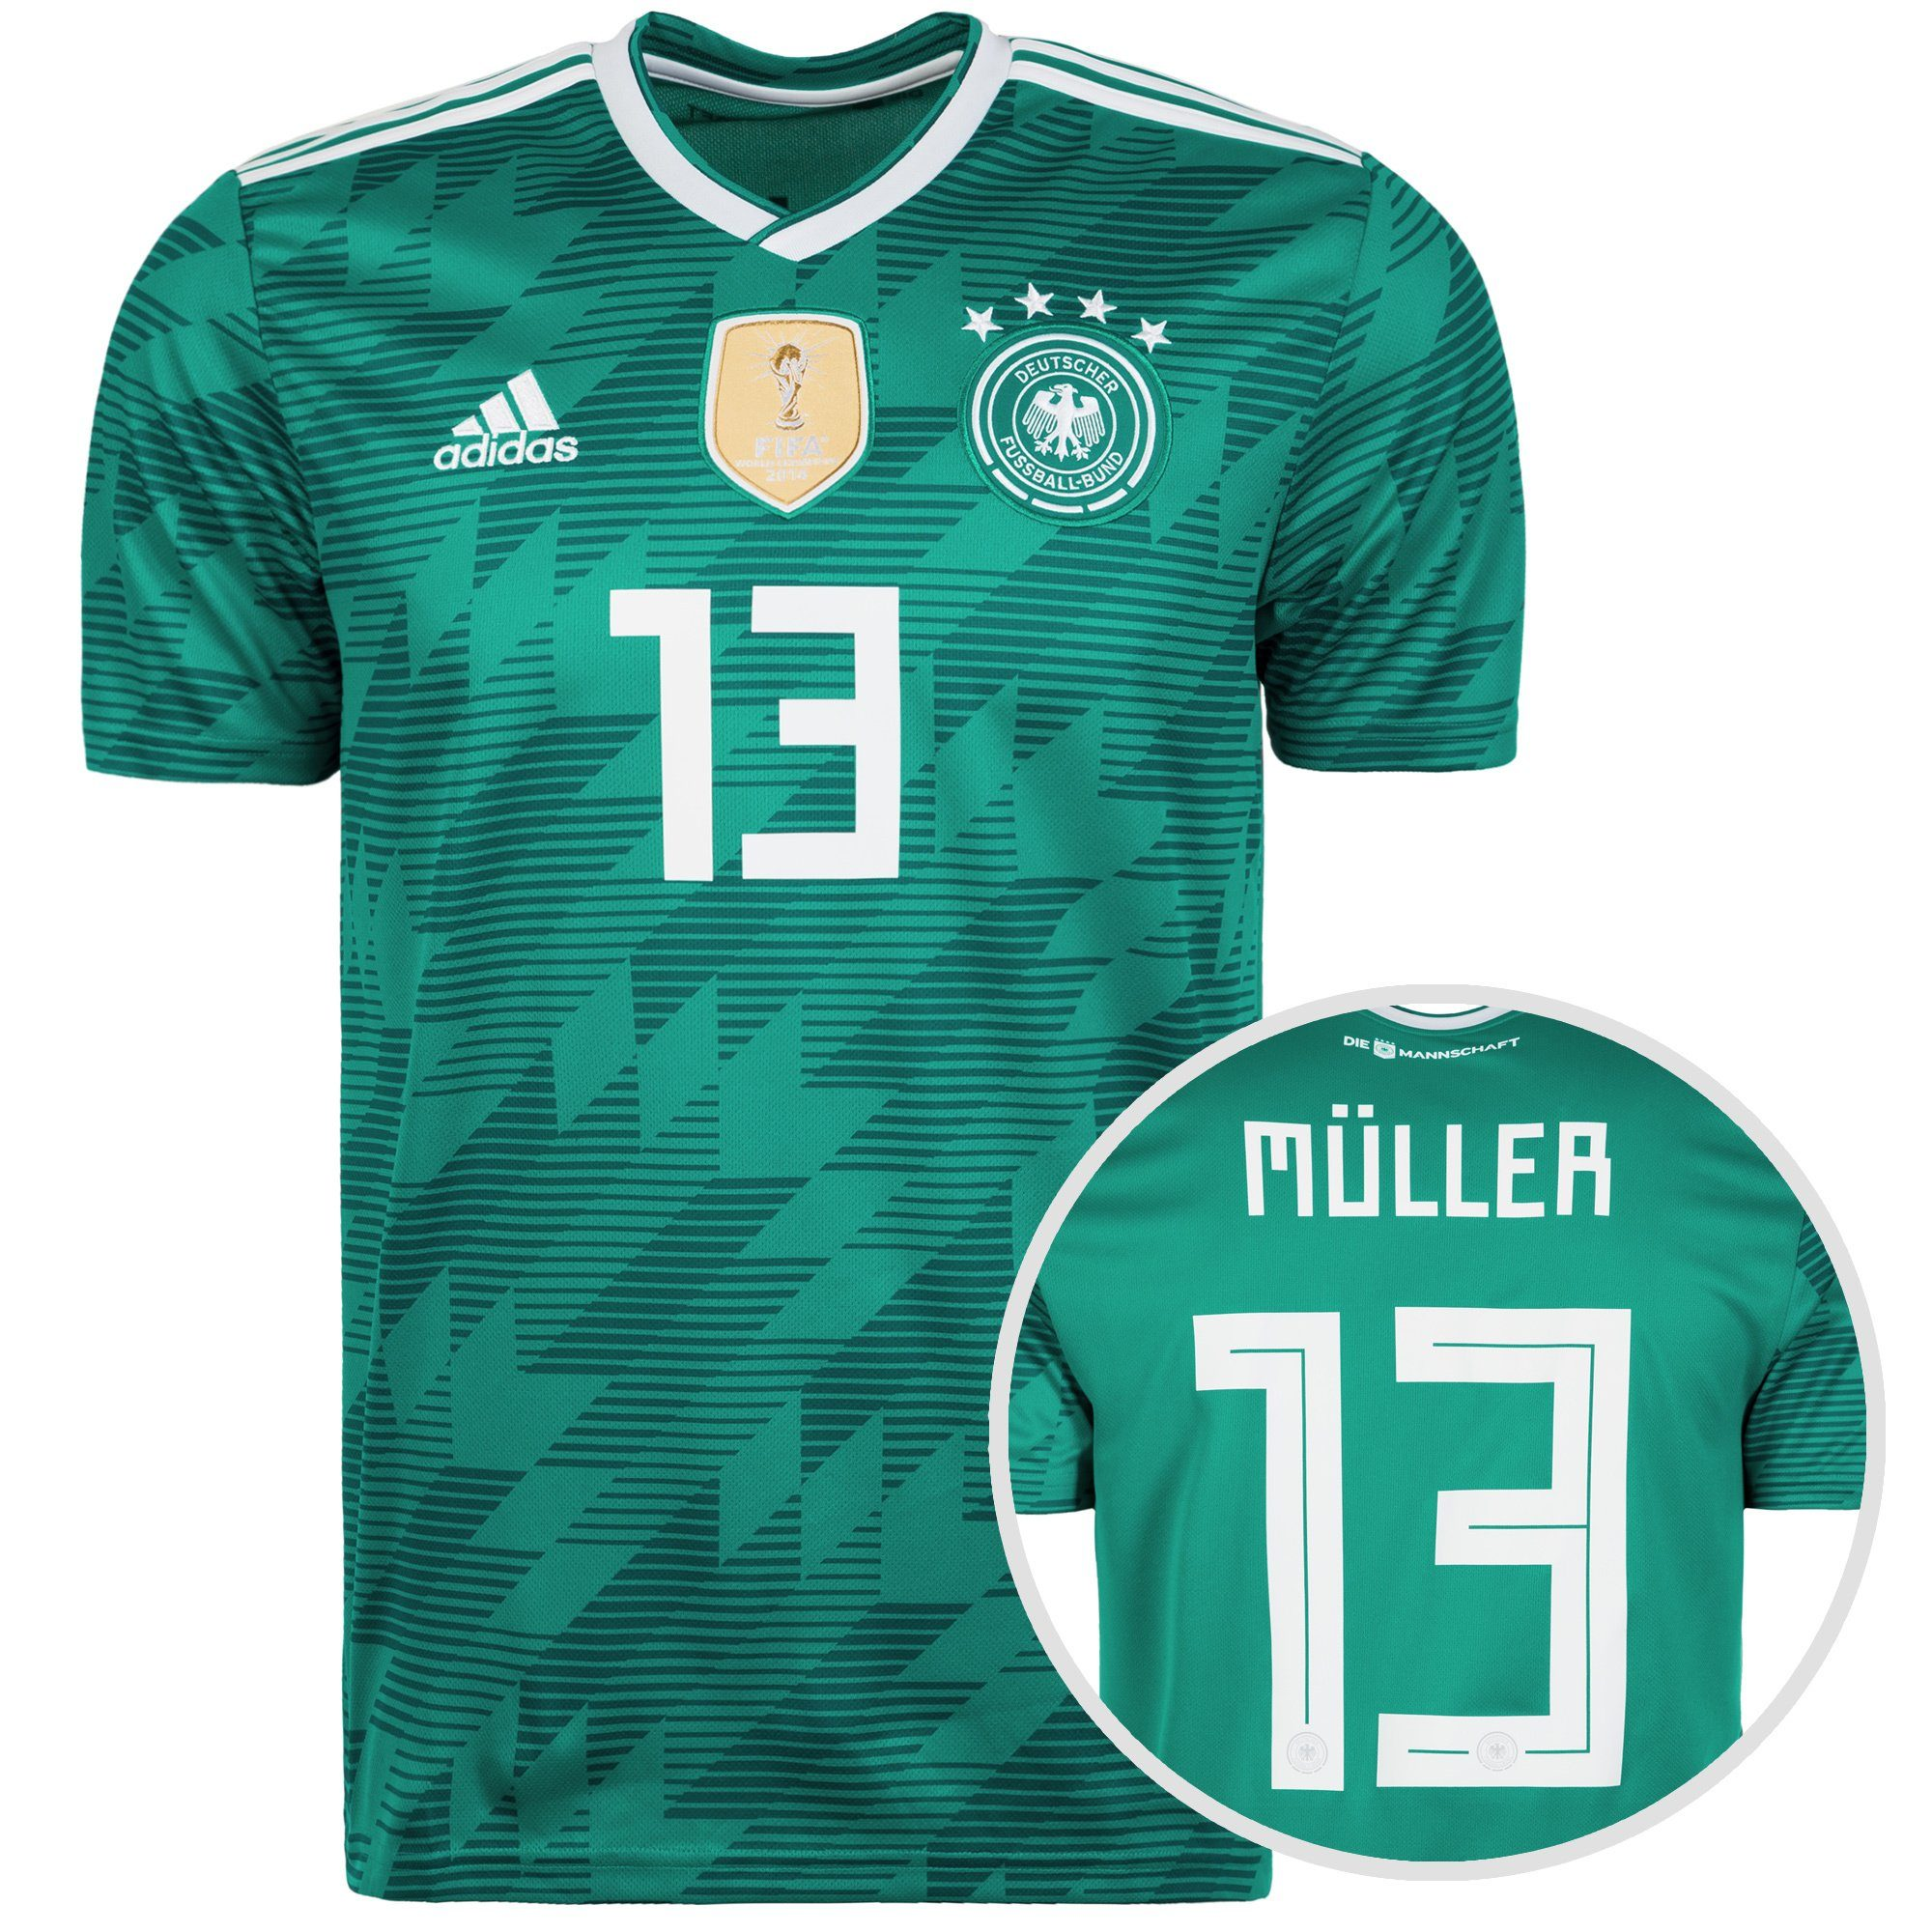 adidas Performance Fußballtrikot Dfb Wm 2018 Müller Auswärts | Sportbekleidung > Trikots > Fußballtrikots | Grün | Wm - Trikot | Adidas Performance